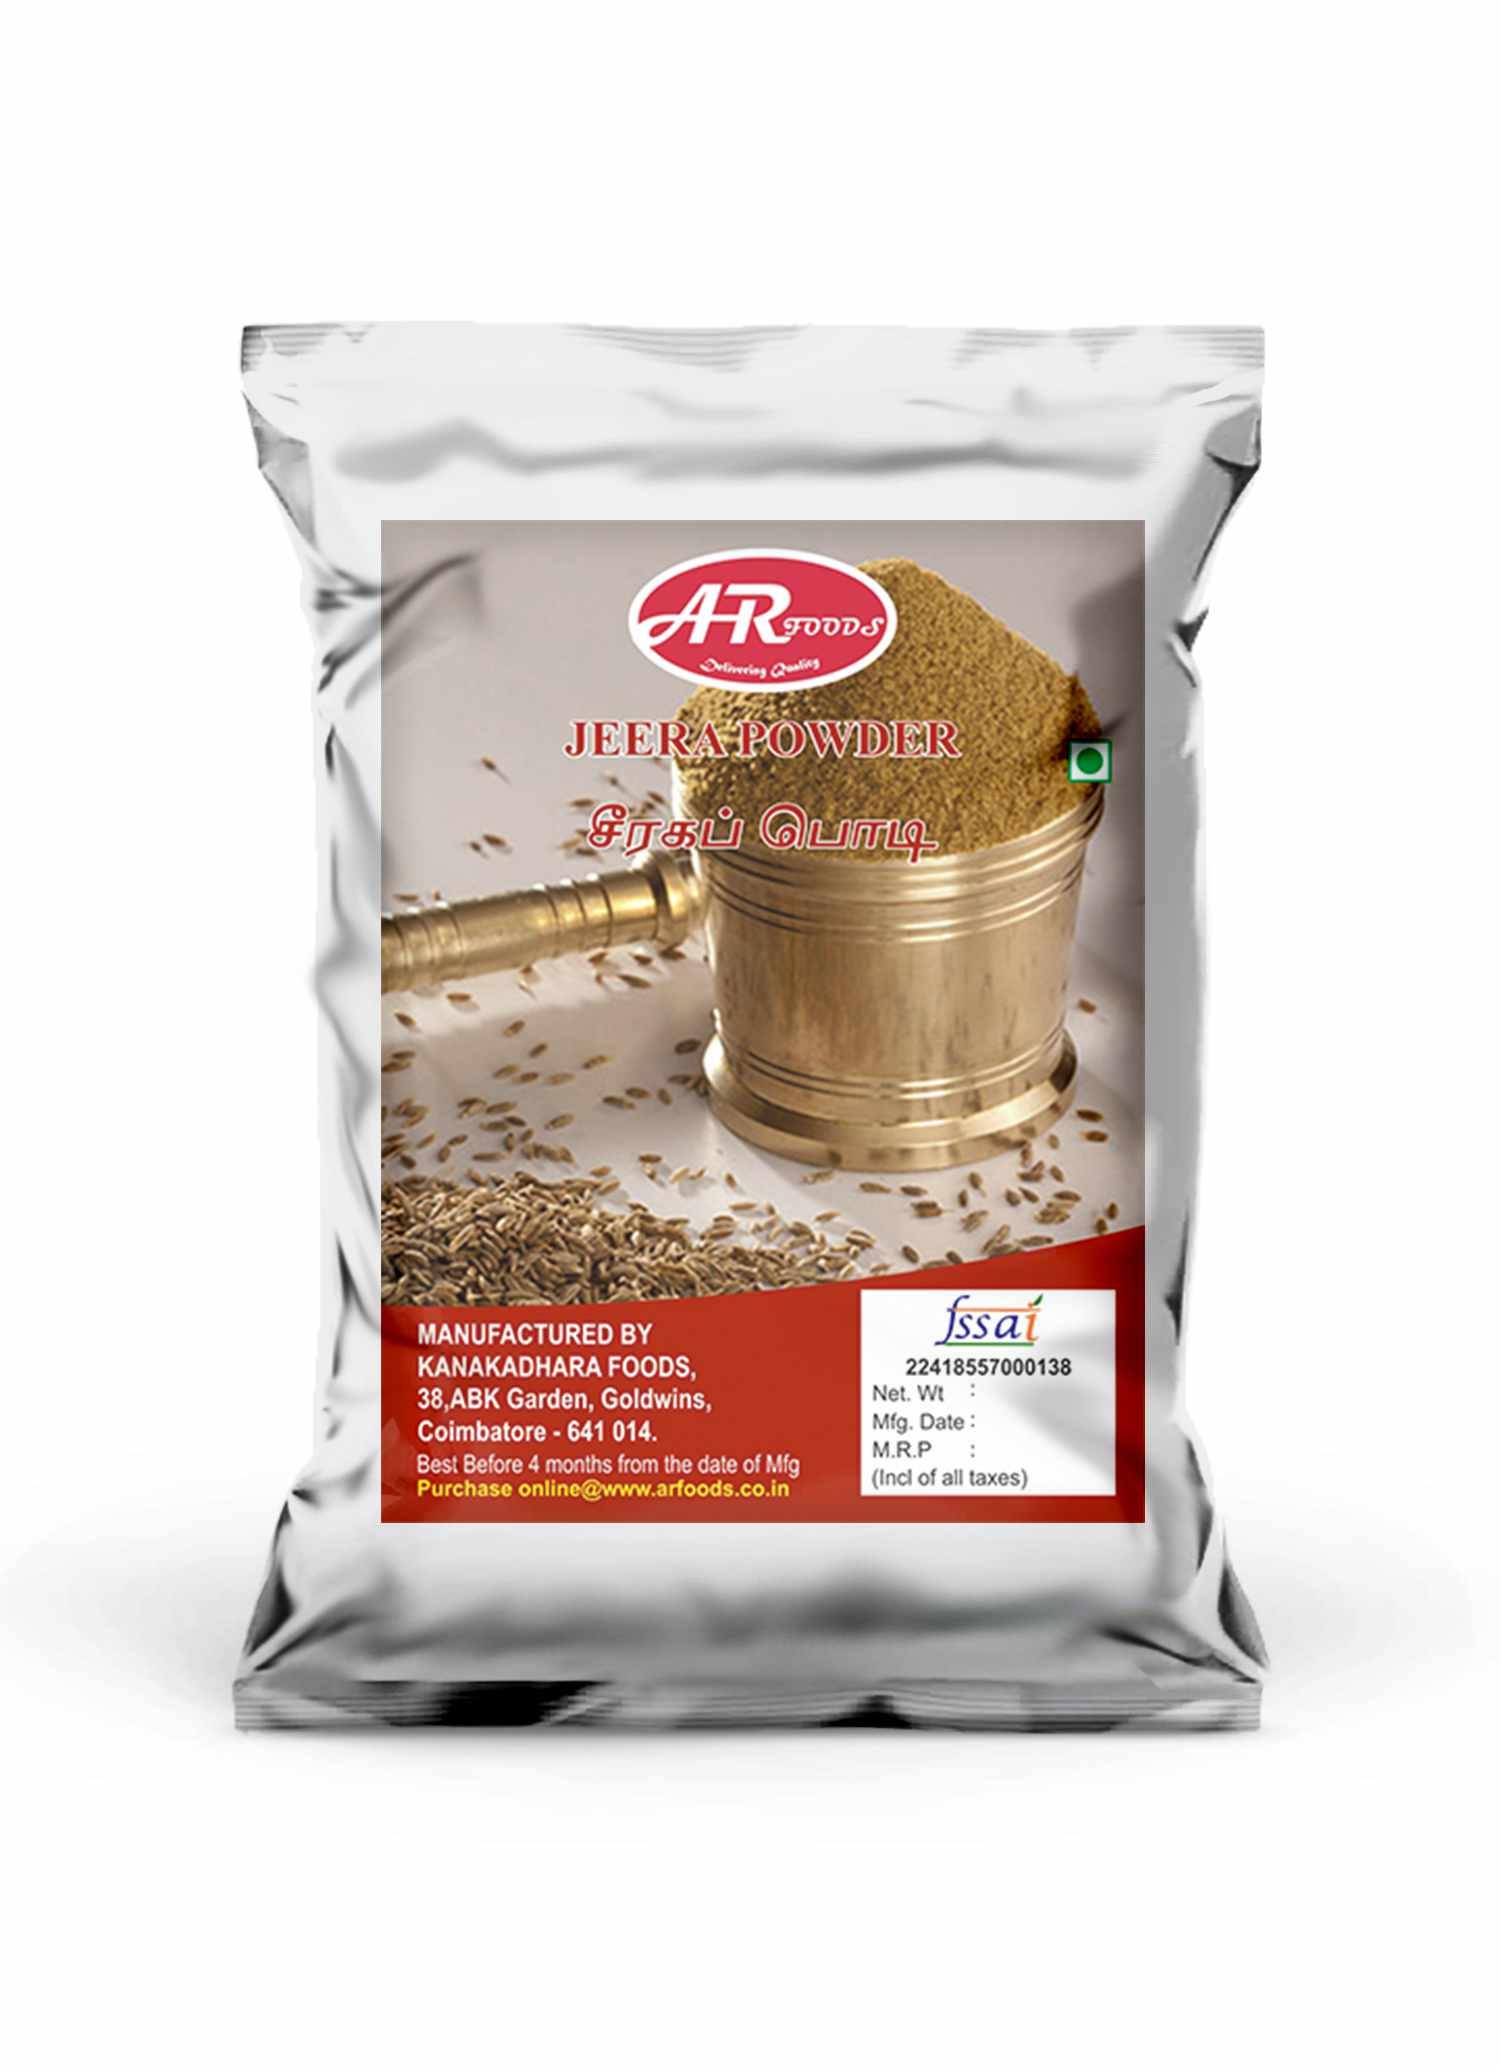 Jeera powder_ar_foods_coimbatore